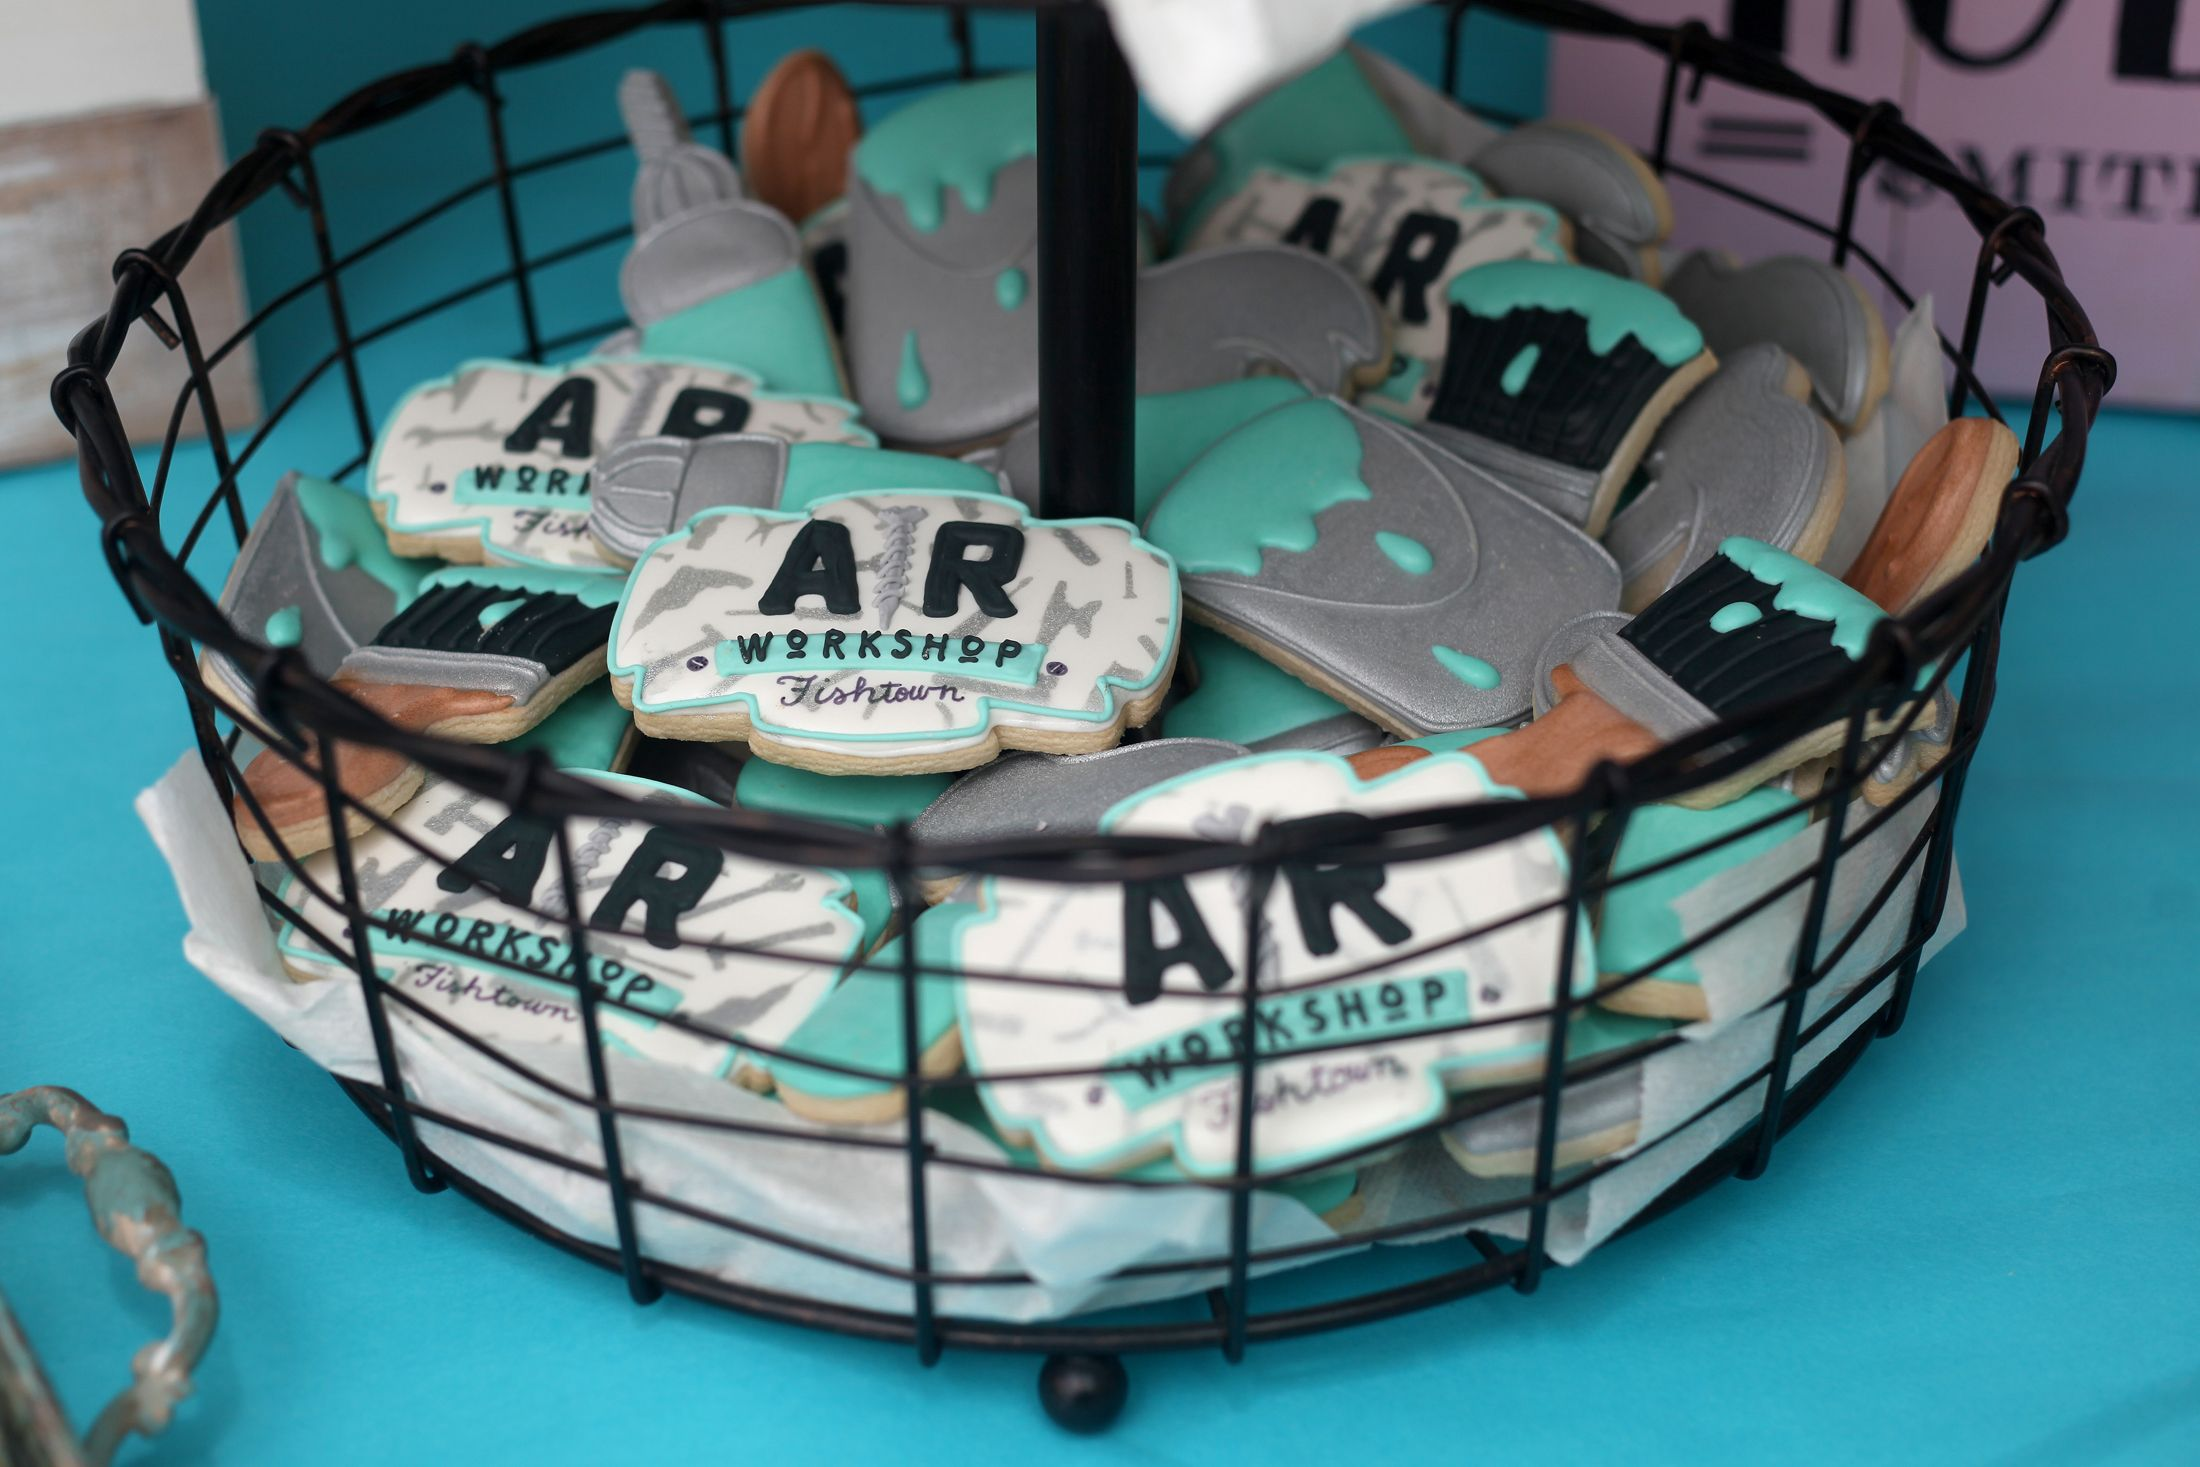 AR Workshop Fishtown